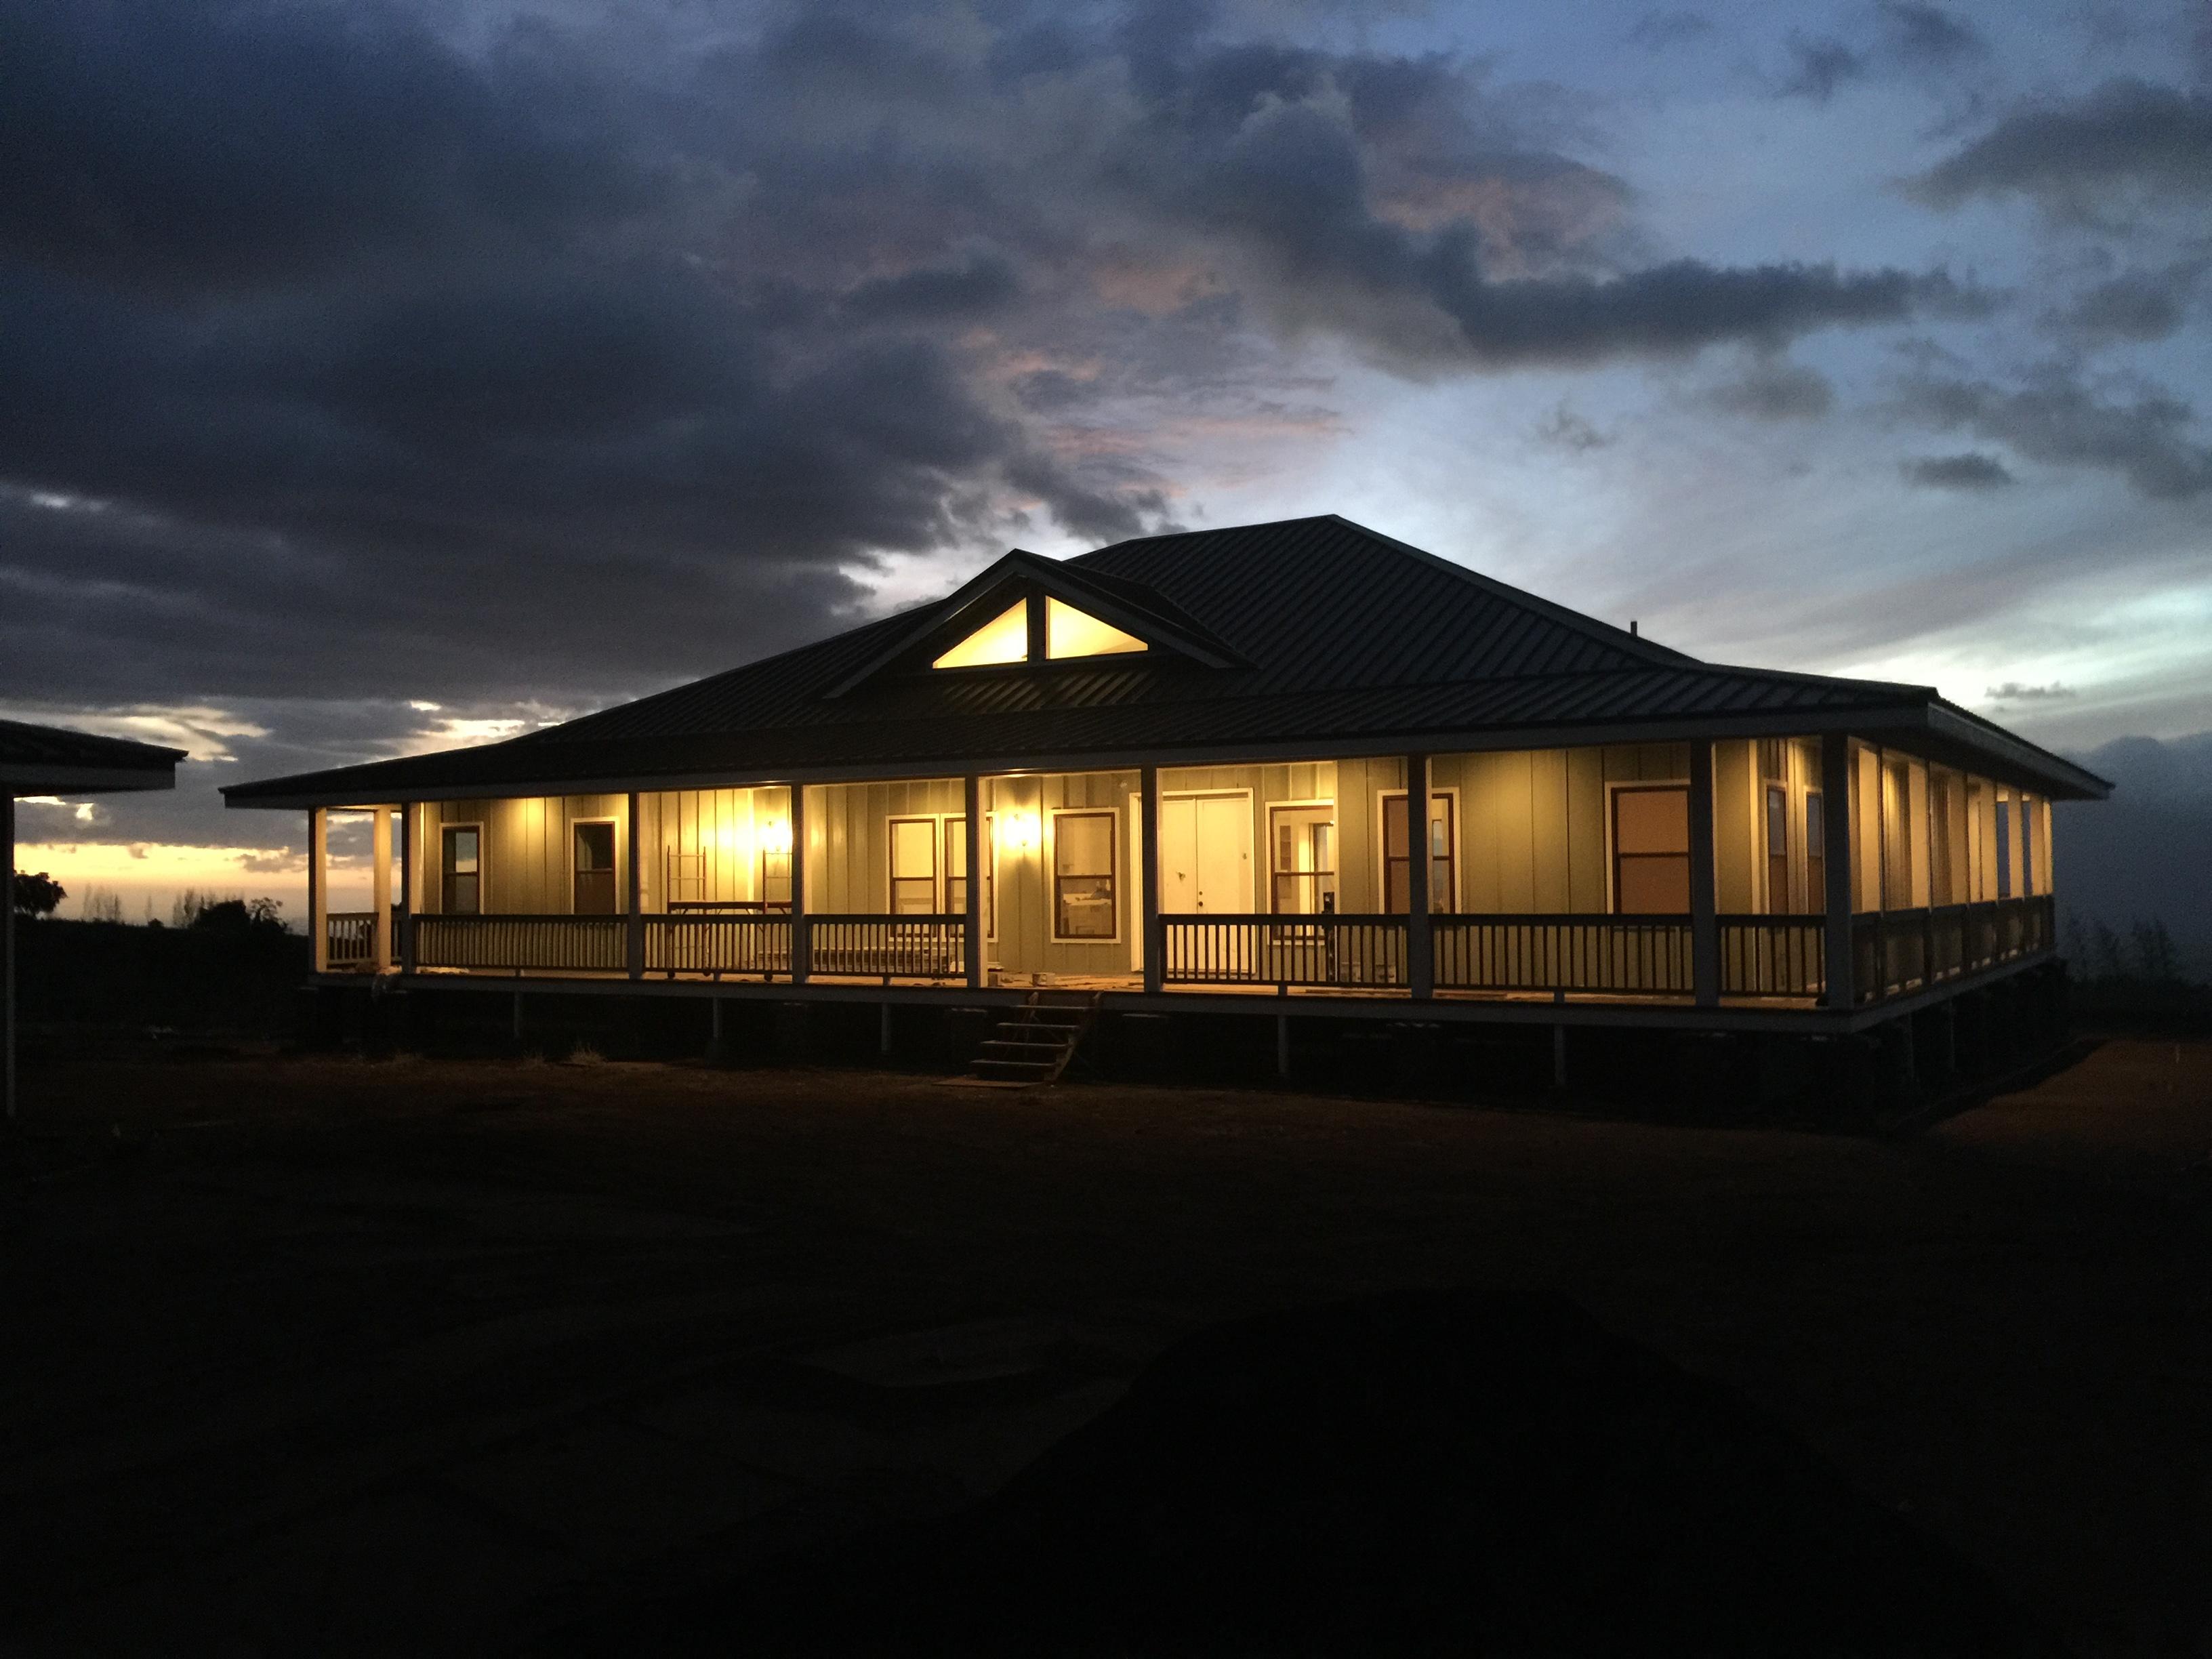 Single Family Home for Sale at Stunning New Custom Plantation Home, Kula 149 Hoomaikai Place Kula, Hawaii 96790 United States